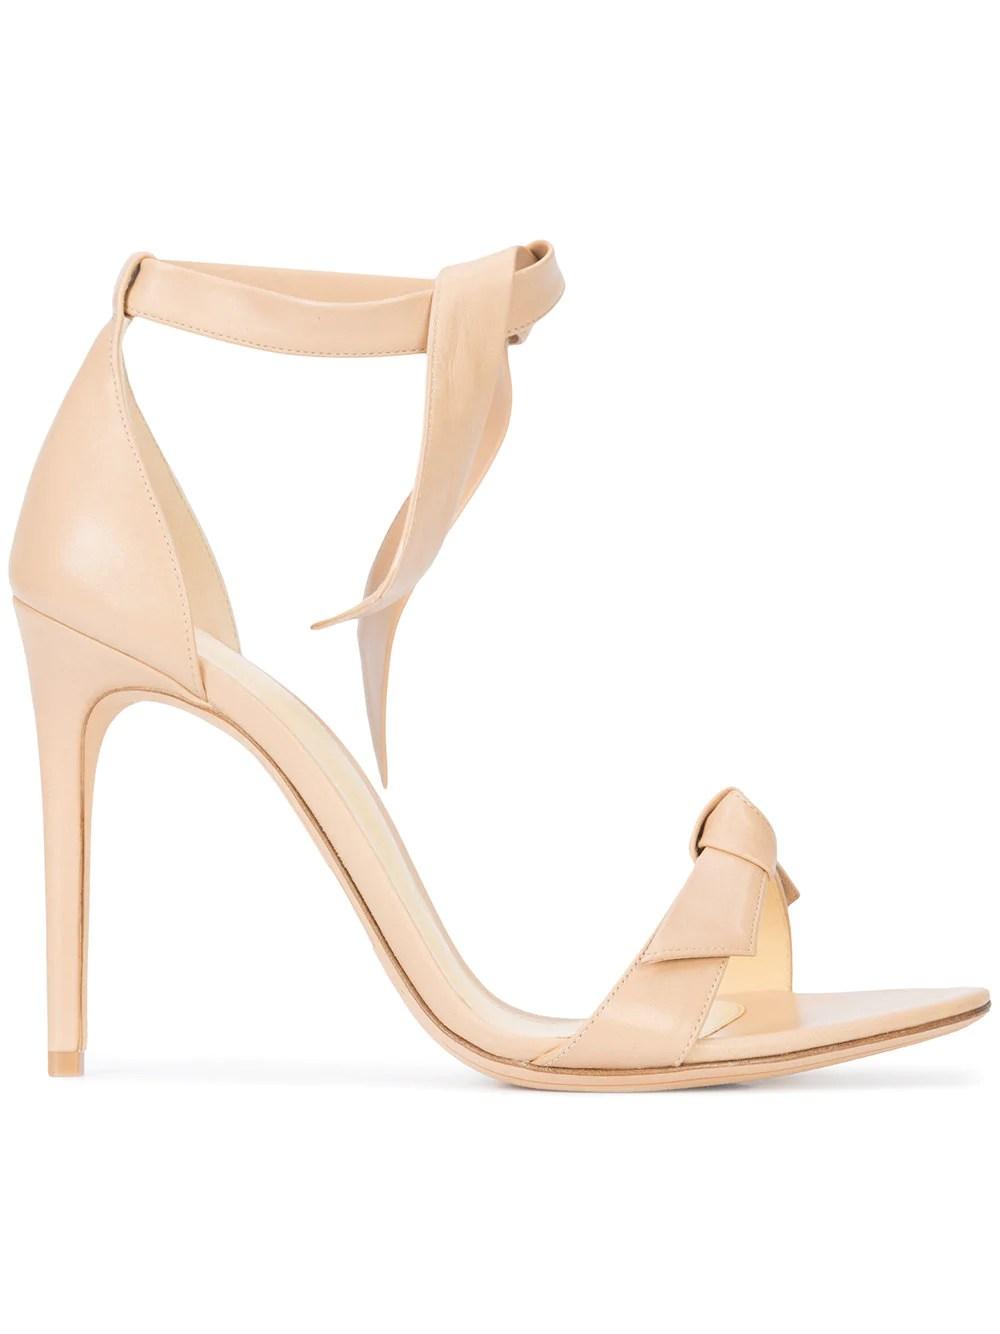 ALEXANDRE BIRMAN Clarita sandals nude